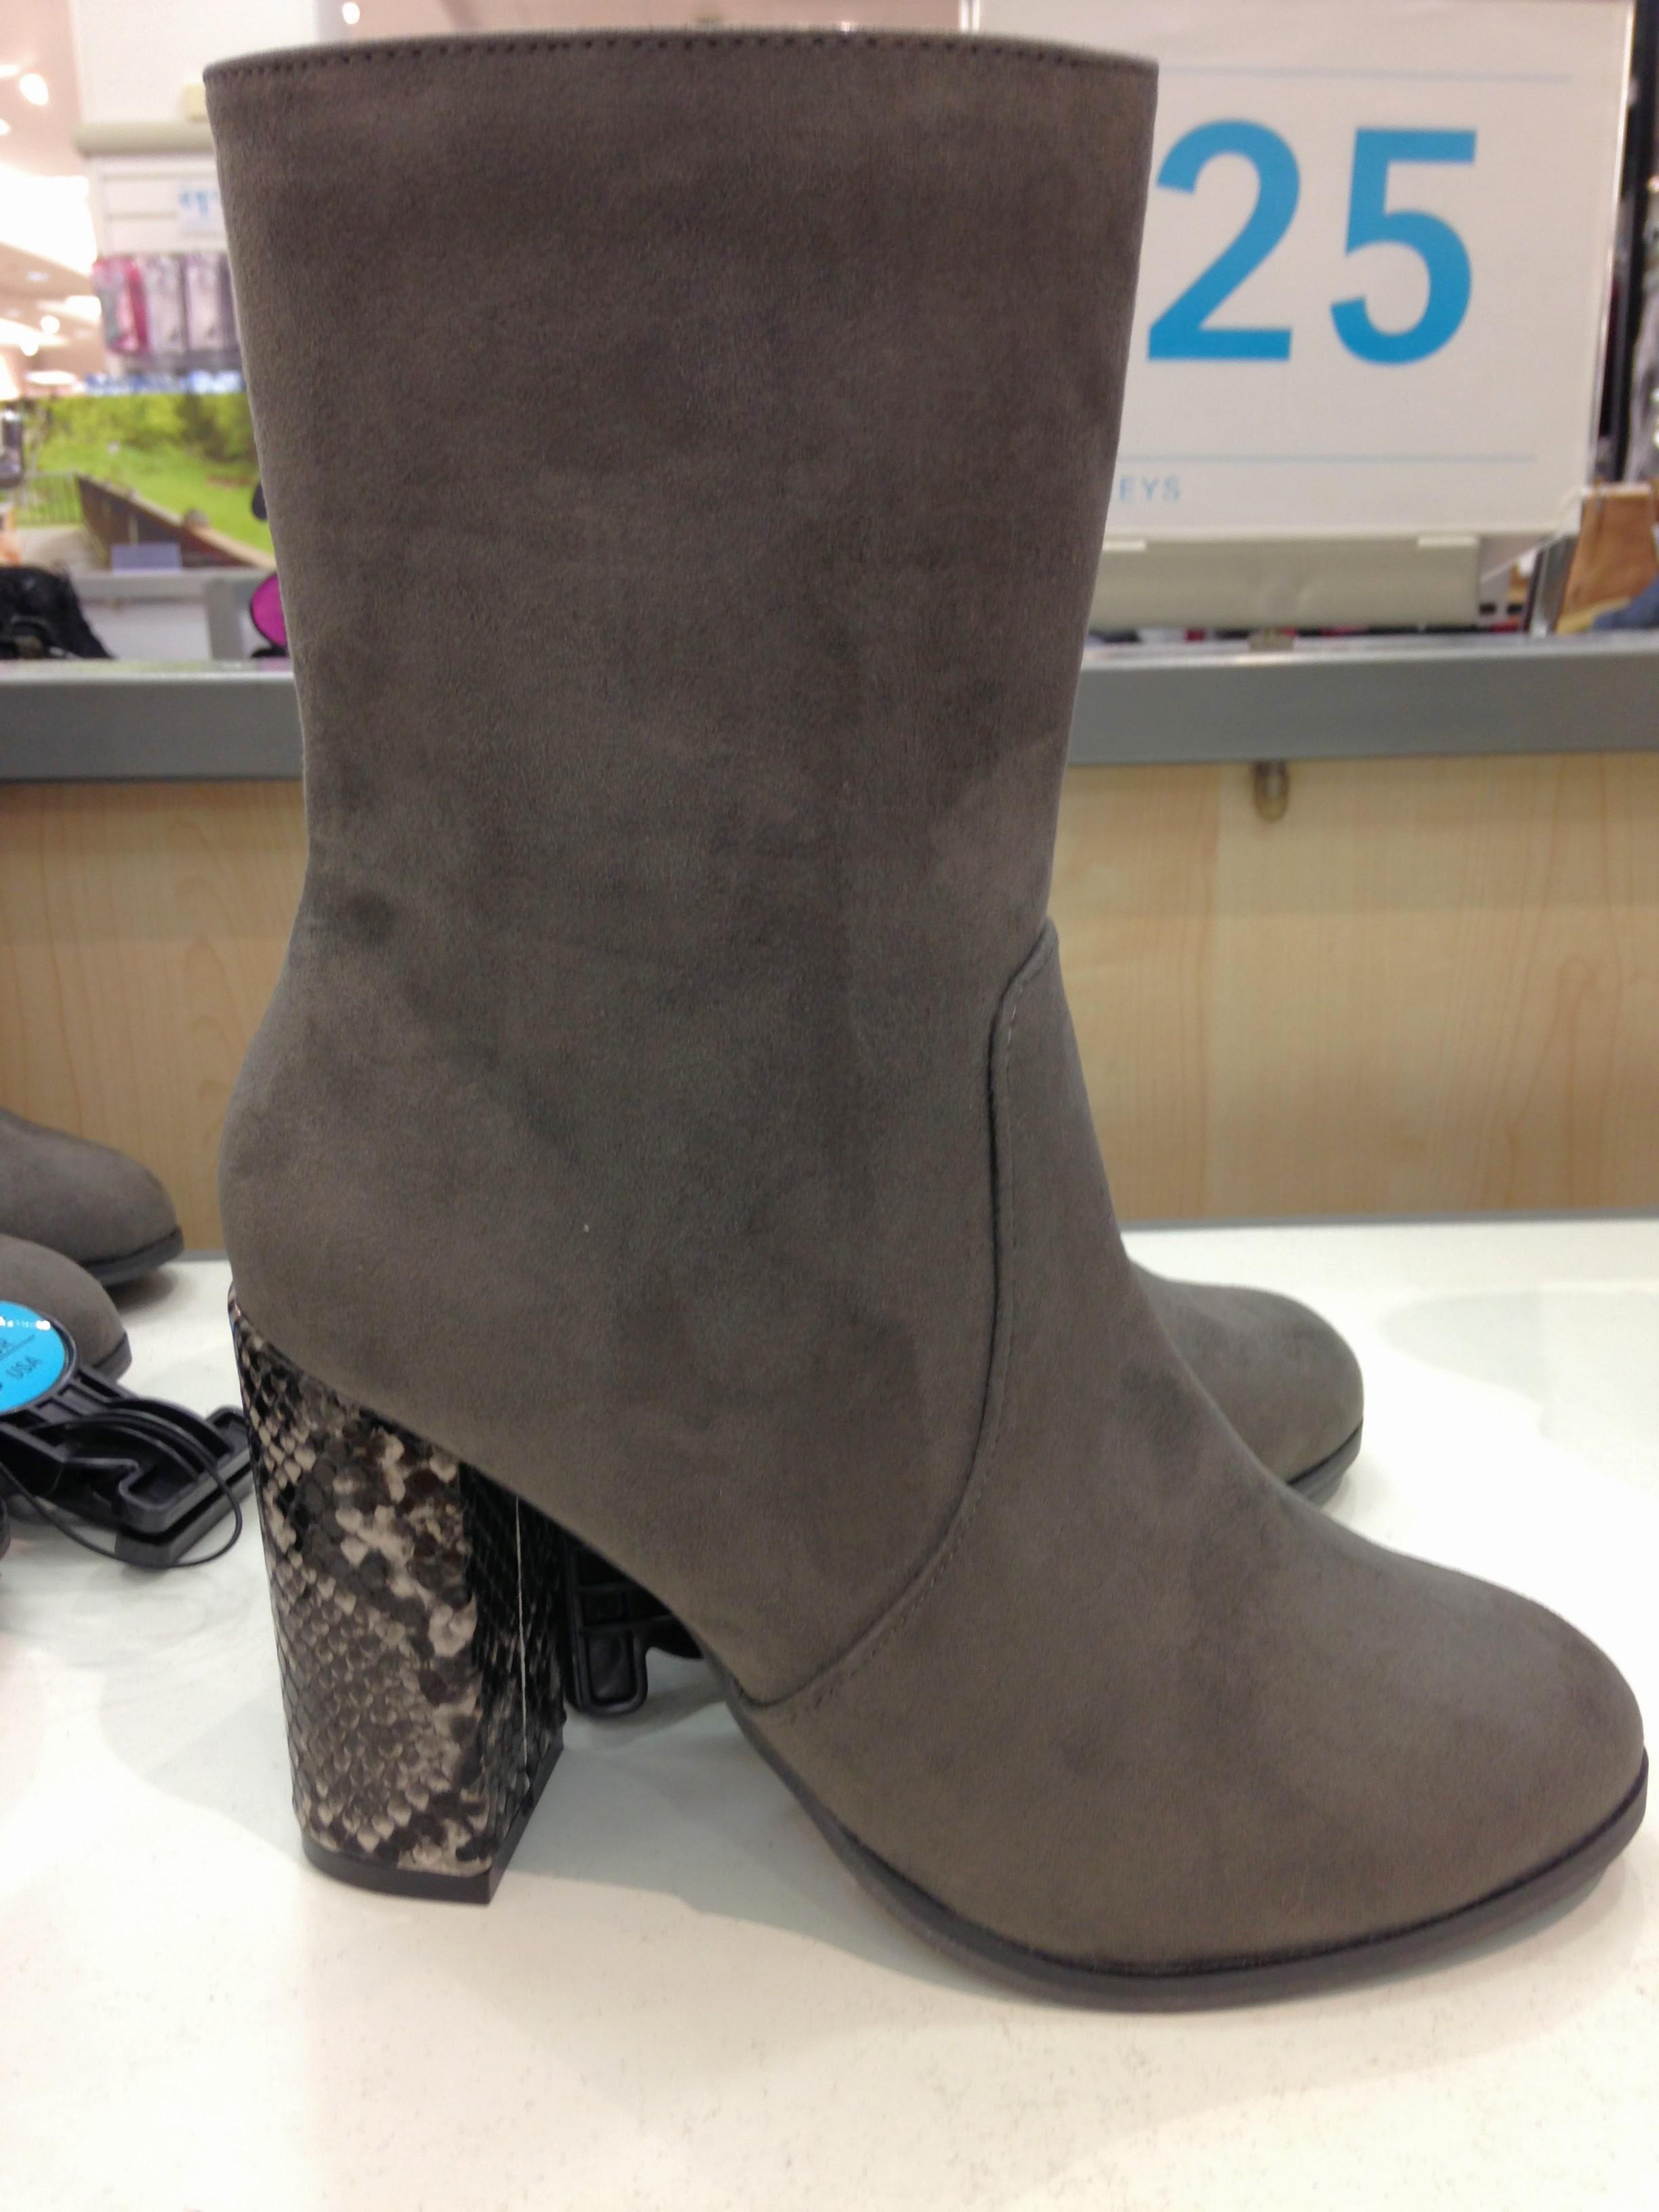 Pennys grey boot